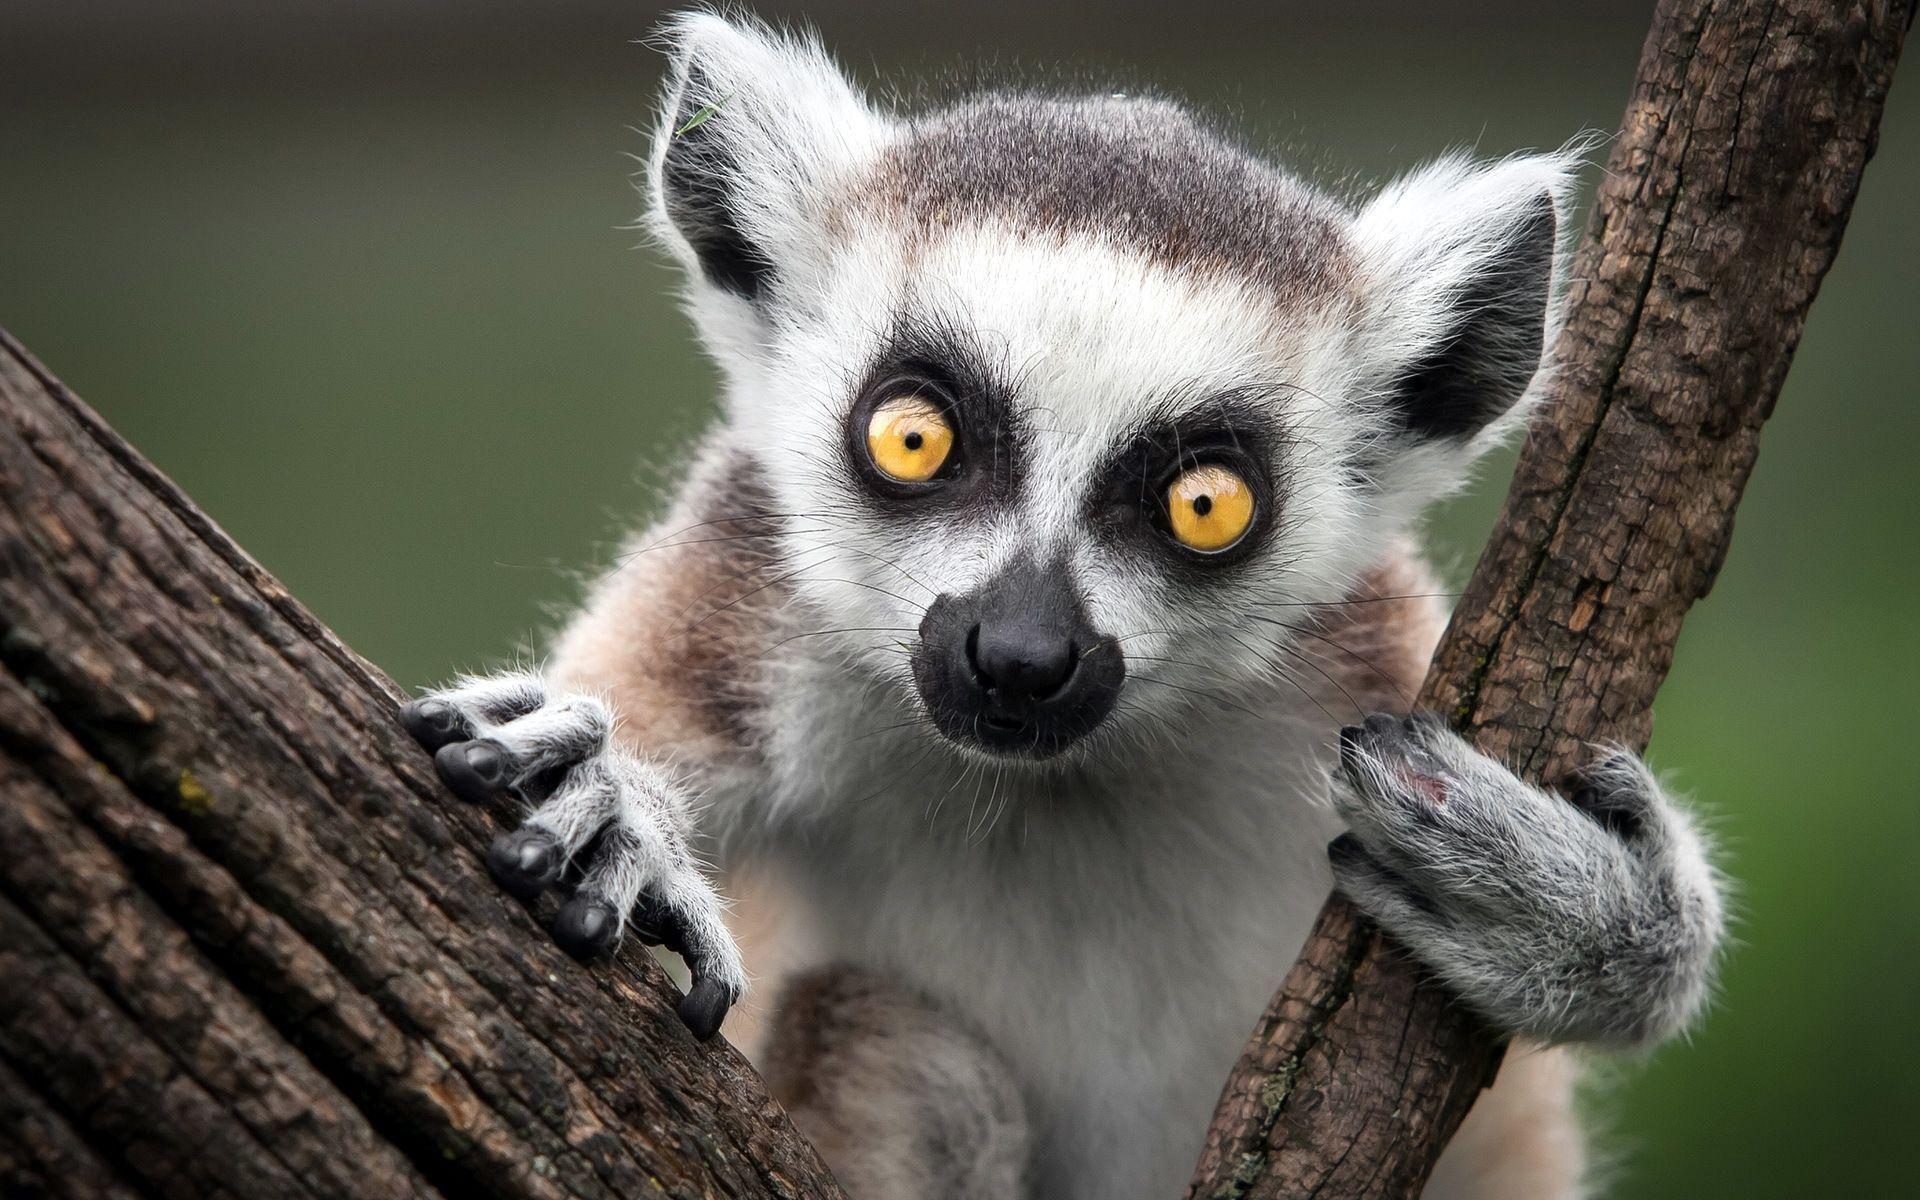 Great Lemur Wallpaper - 0bec682a266ed7c24597b17da68f7ef0  Gallery_611651.jpg